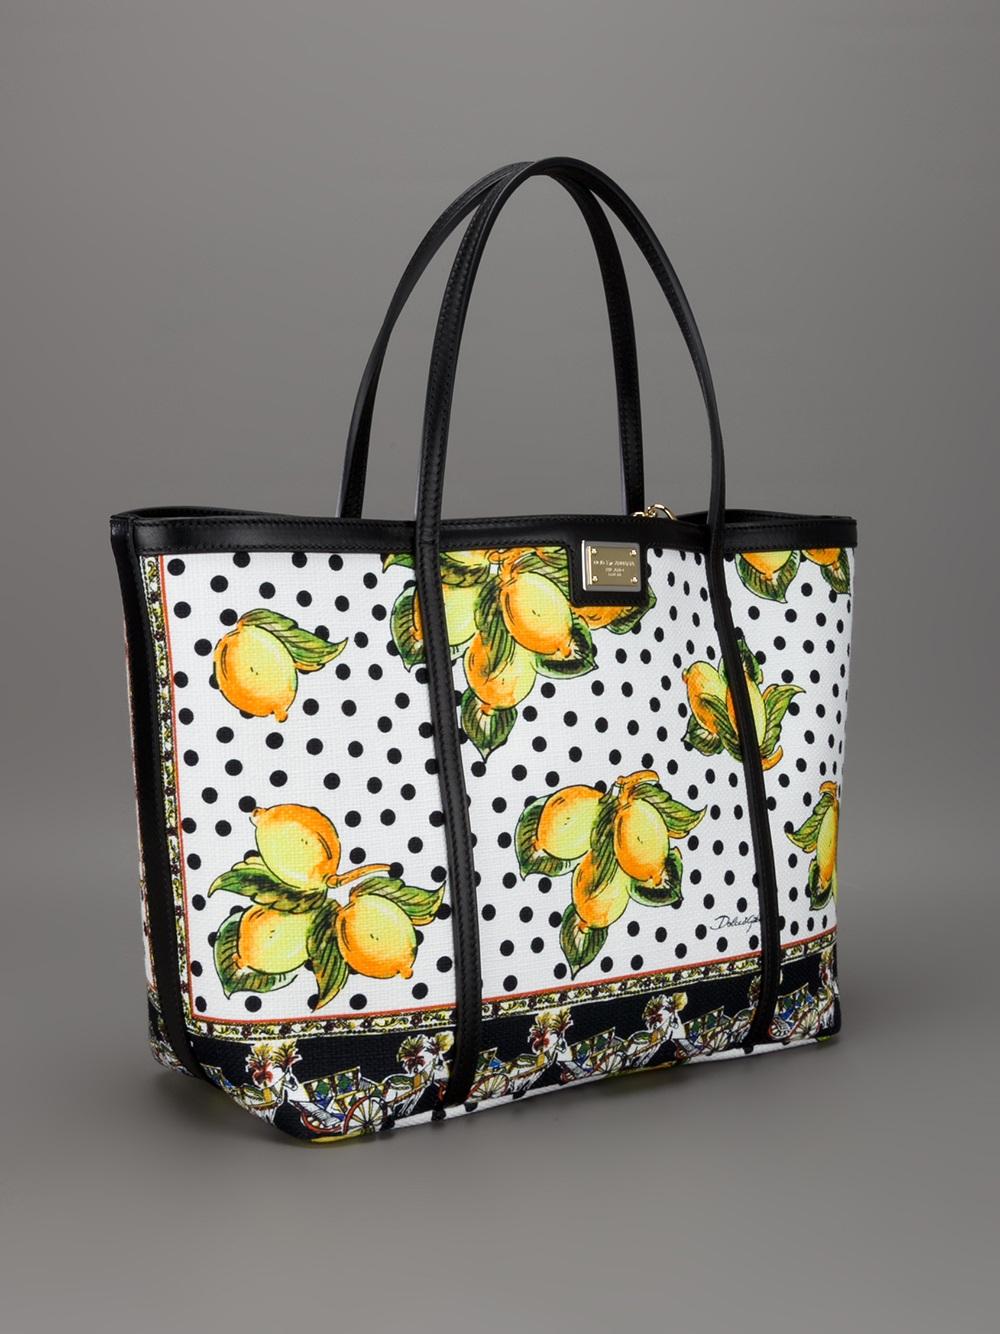 Lyst - Dolce   Gabbana Lemon Print Shopper in Yellow 603bcc27ad38d